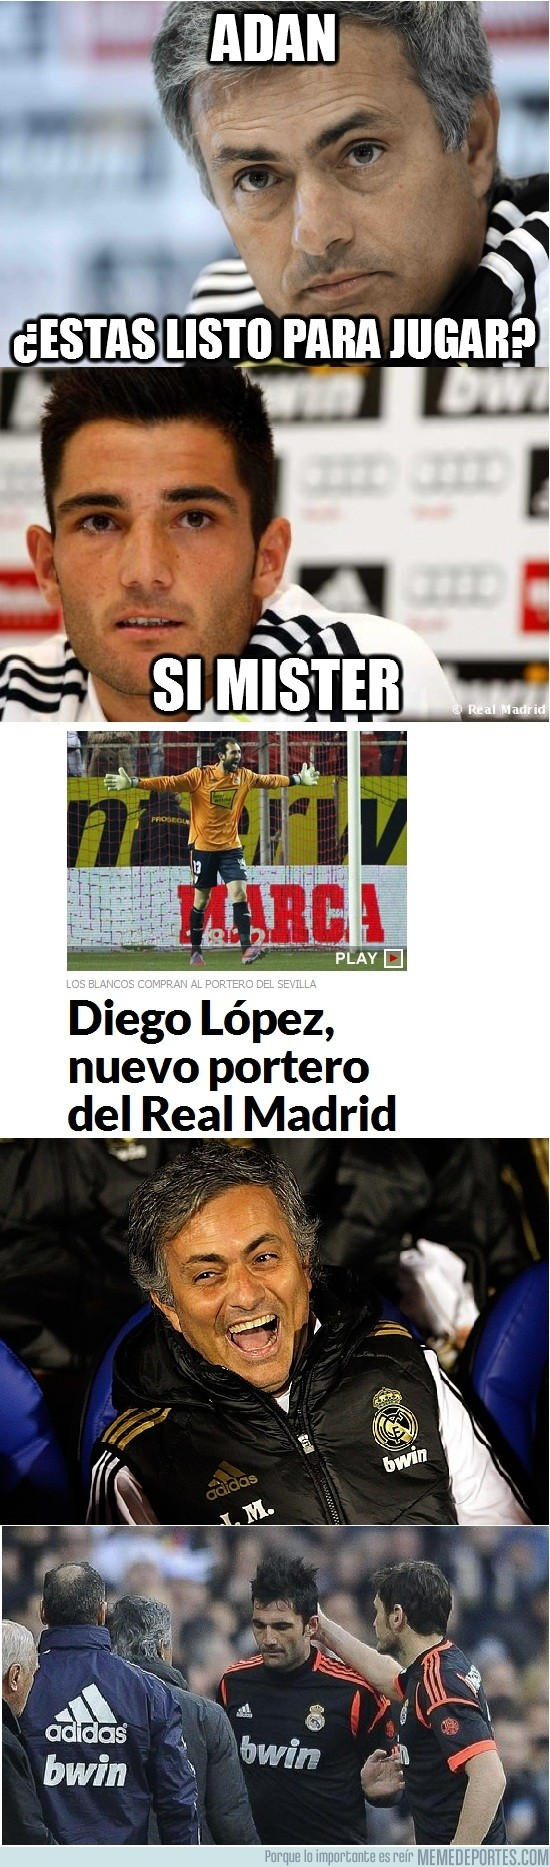 73499 - Mourinho, master troll of the master trolls